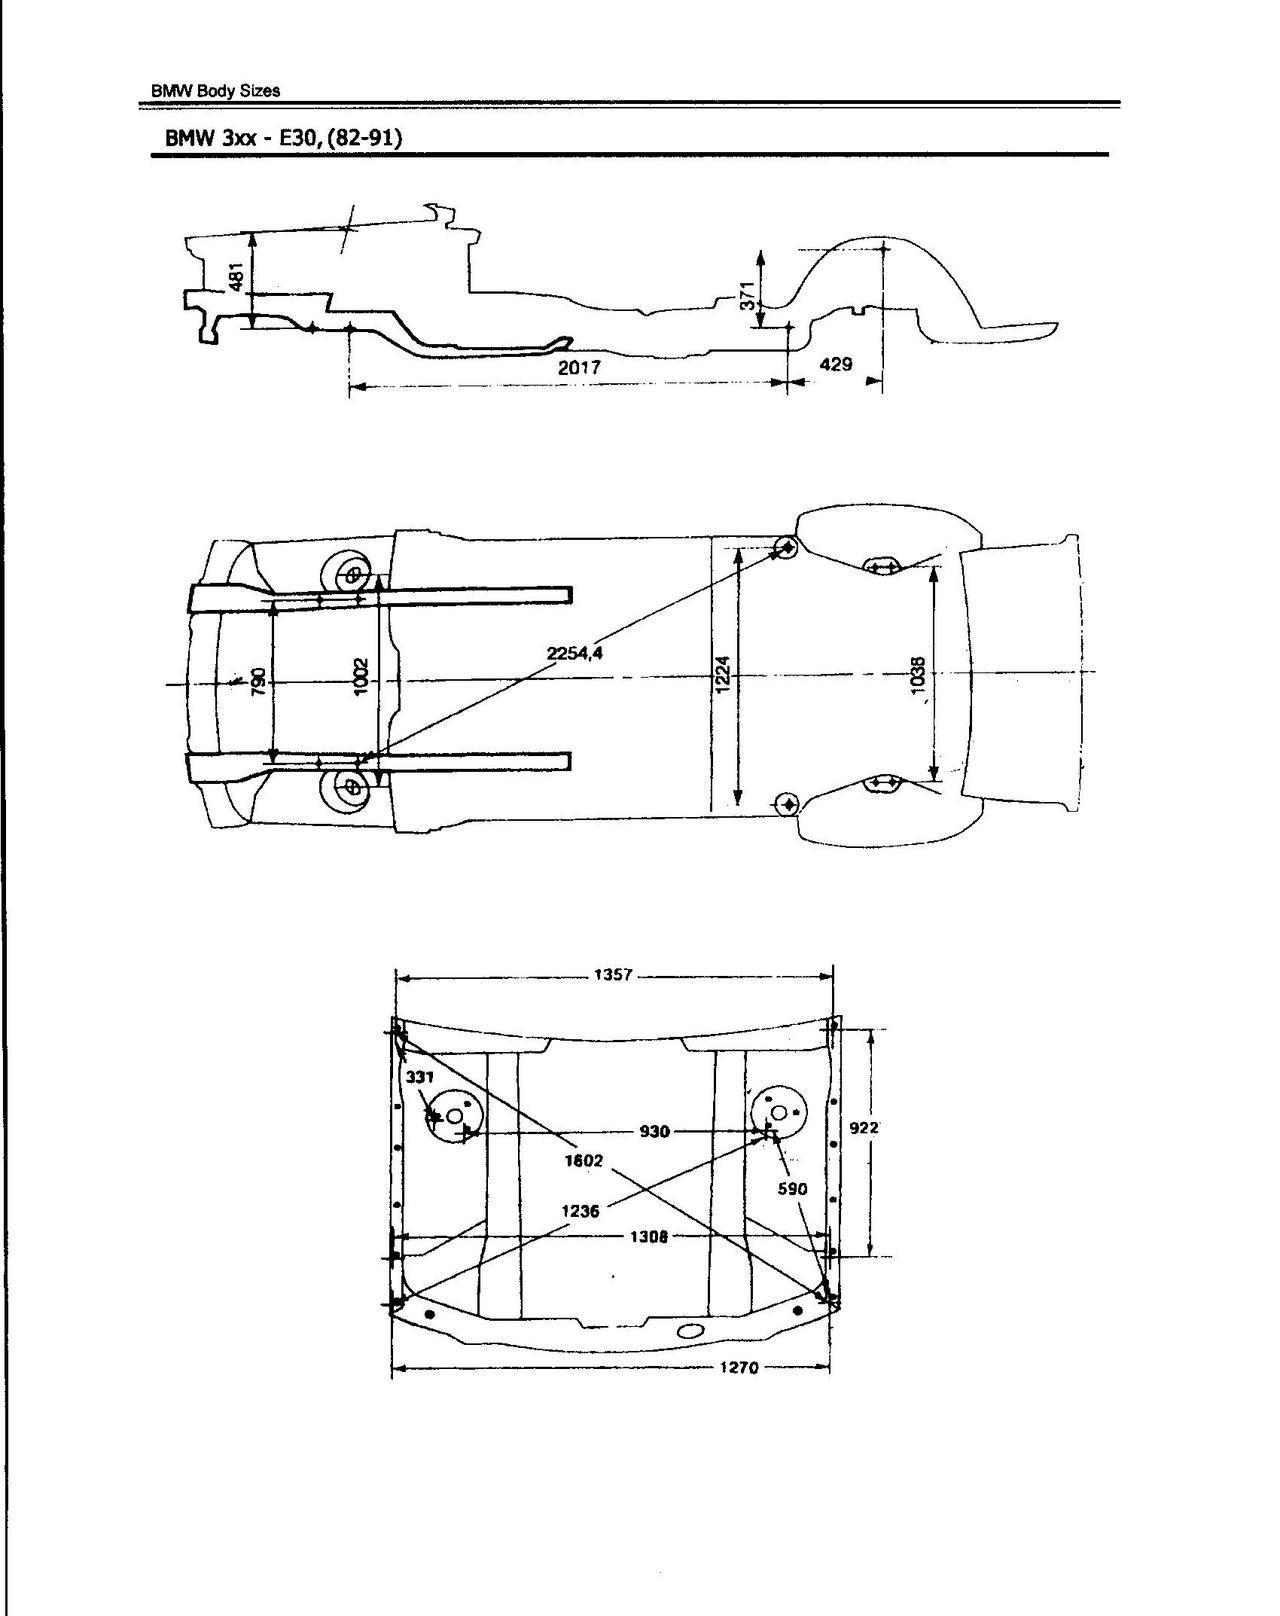 Чертеж заводских размеров кузова BMW E30